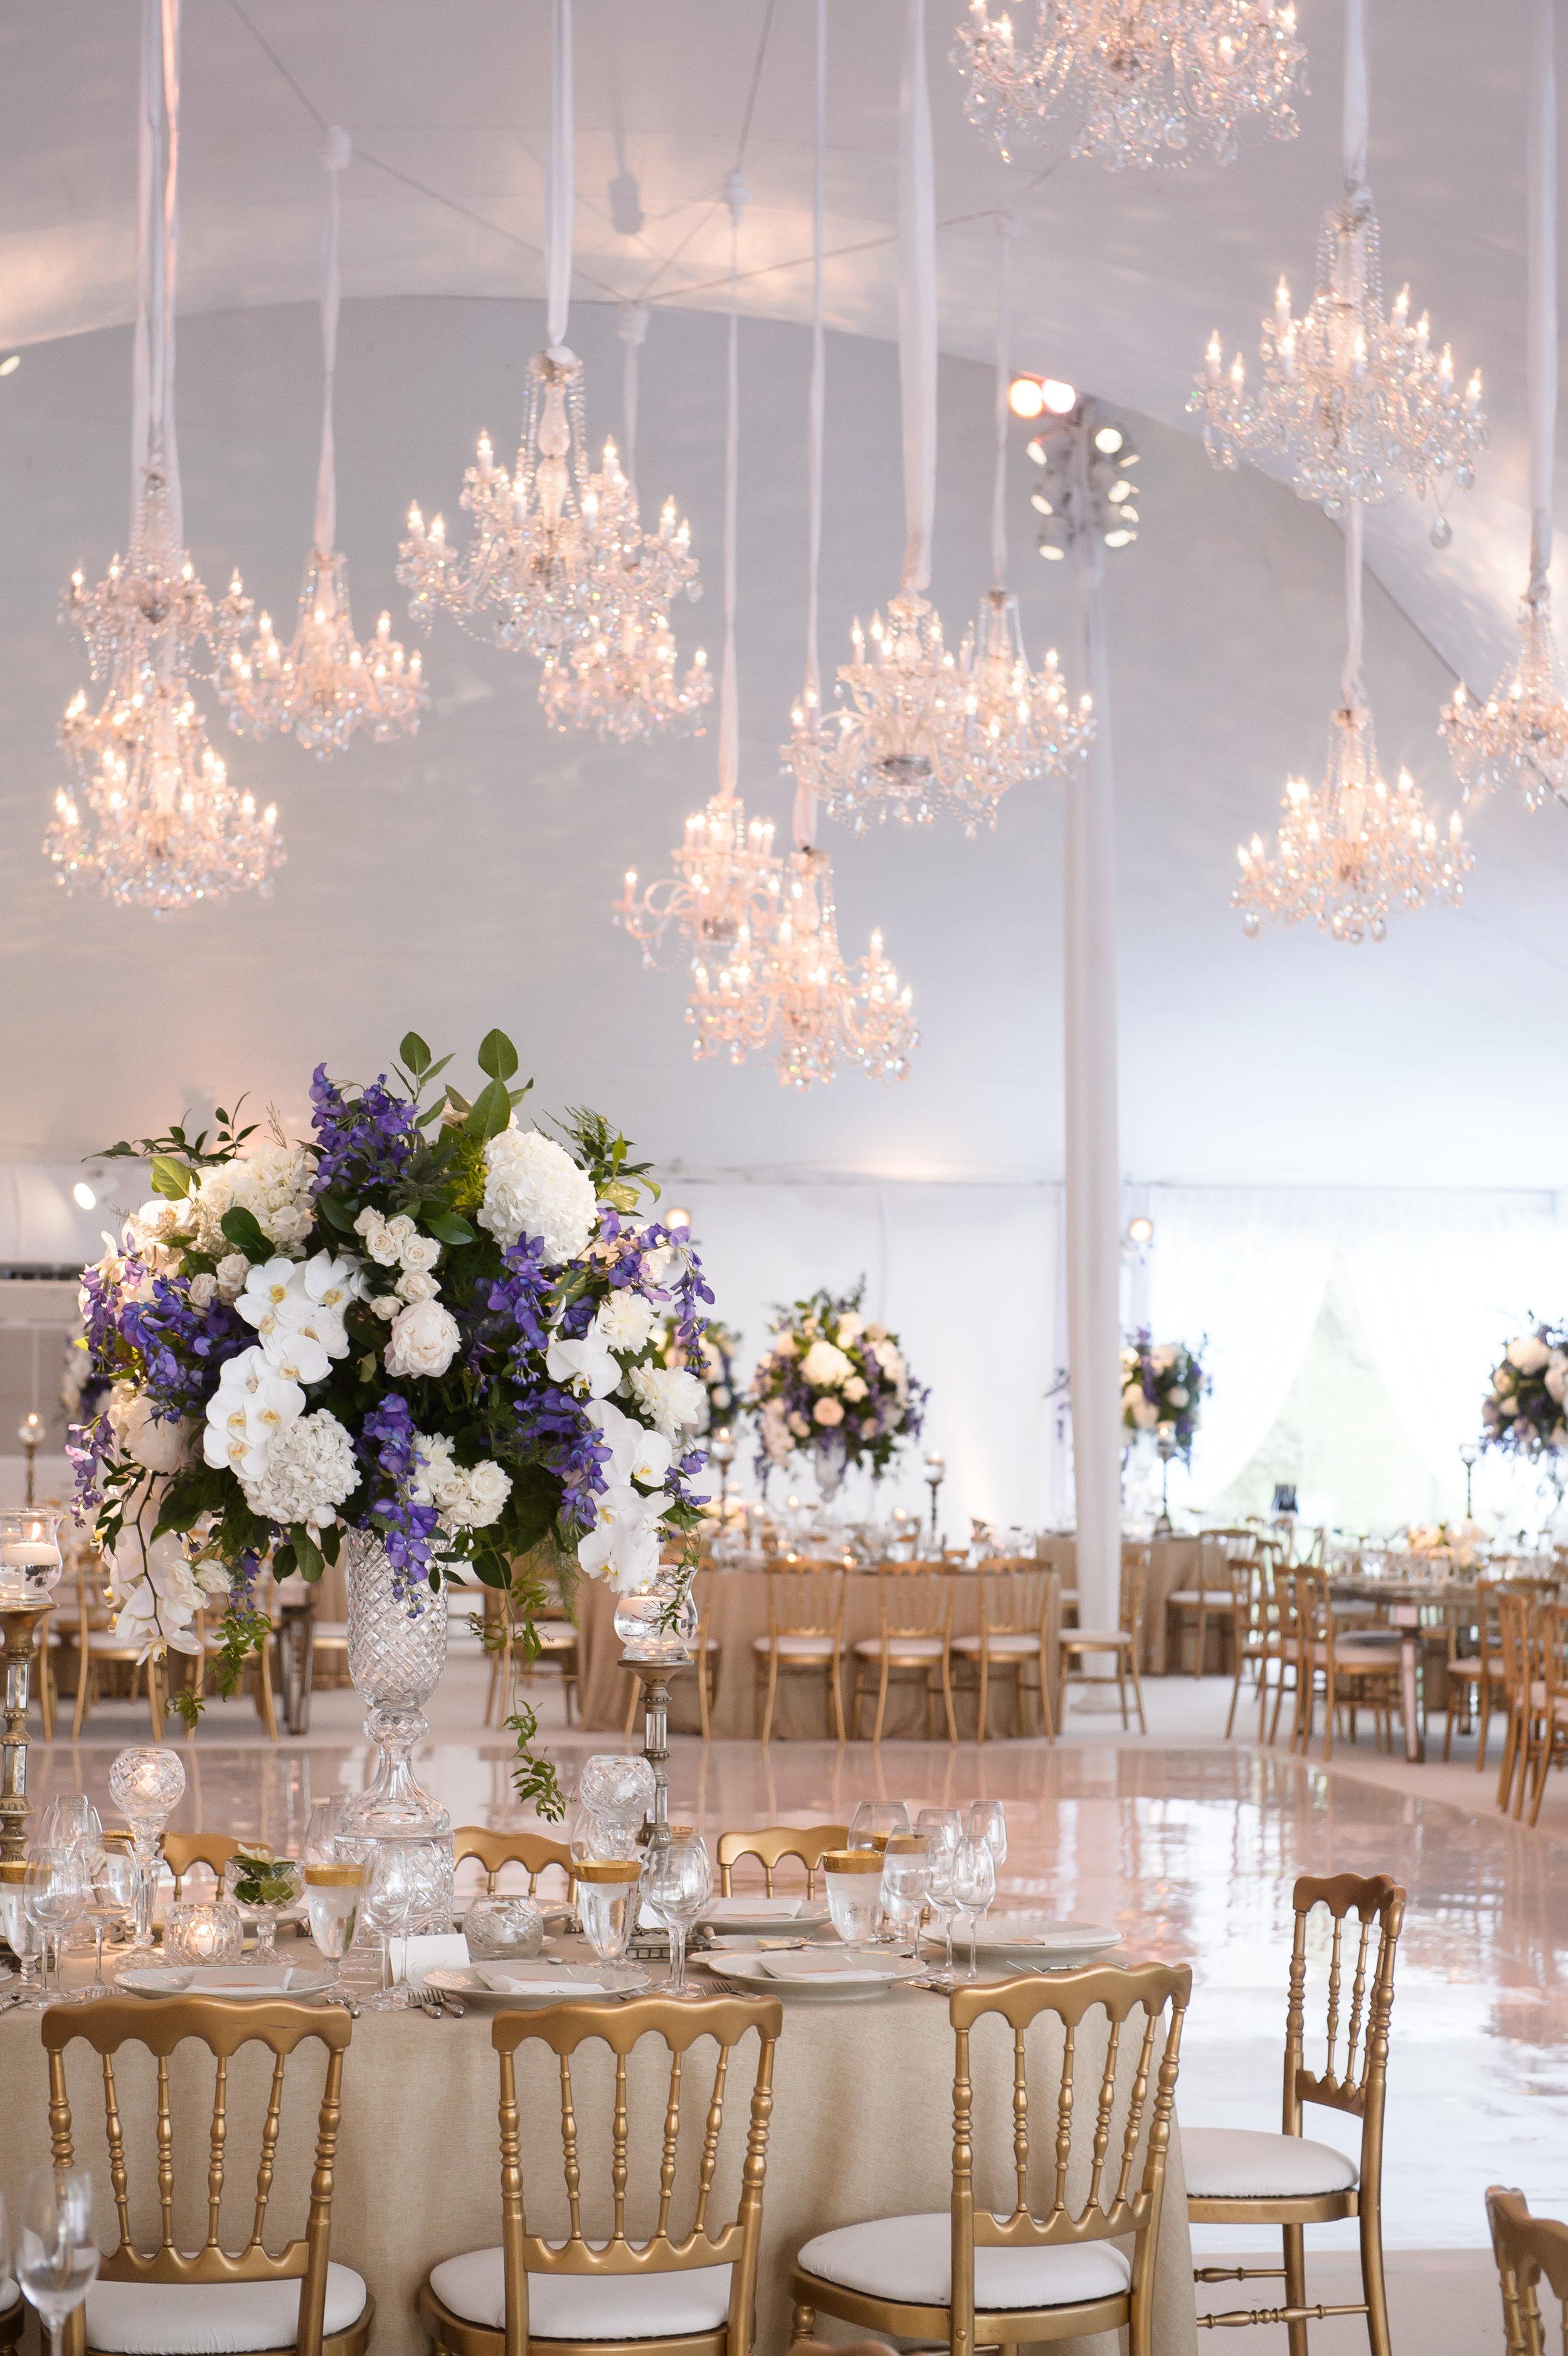 Bliss Weddings-Destination Planner-Tented Weddings-Lake Geneva.jpg